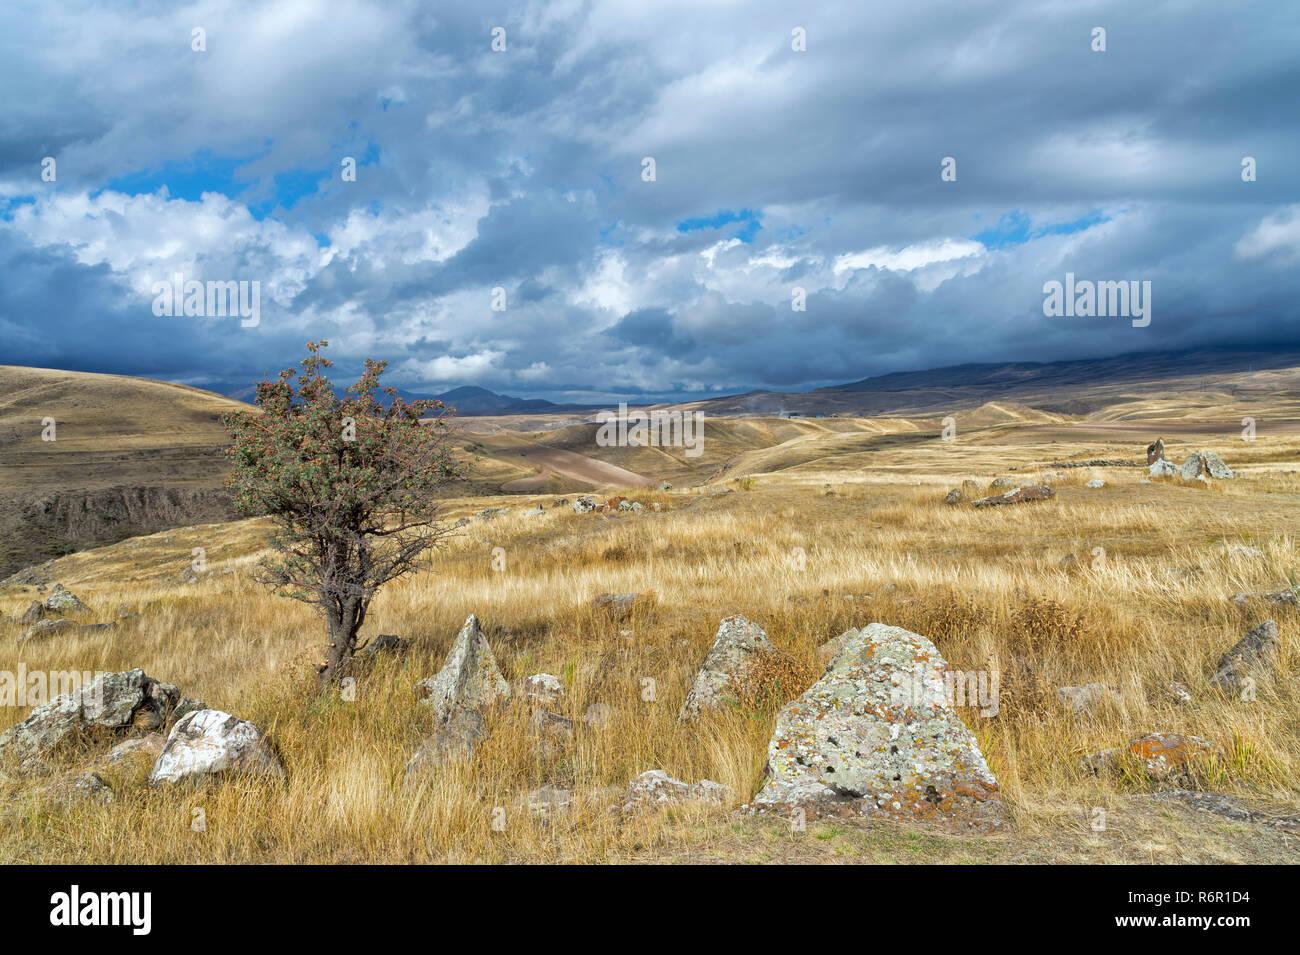 Prehistoric archaeological Karer site of Zorats, Sisian, Syunik Province, Armenia, Caucasus, Middle East, Asia - Stock Image